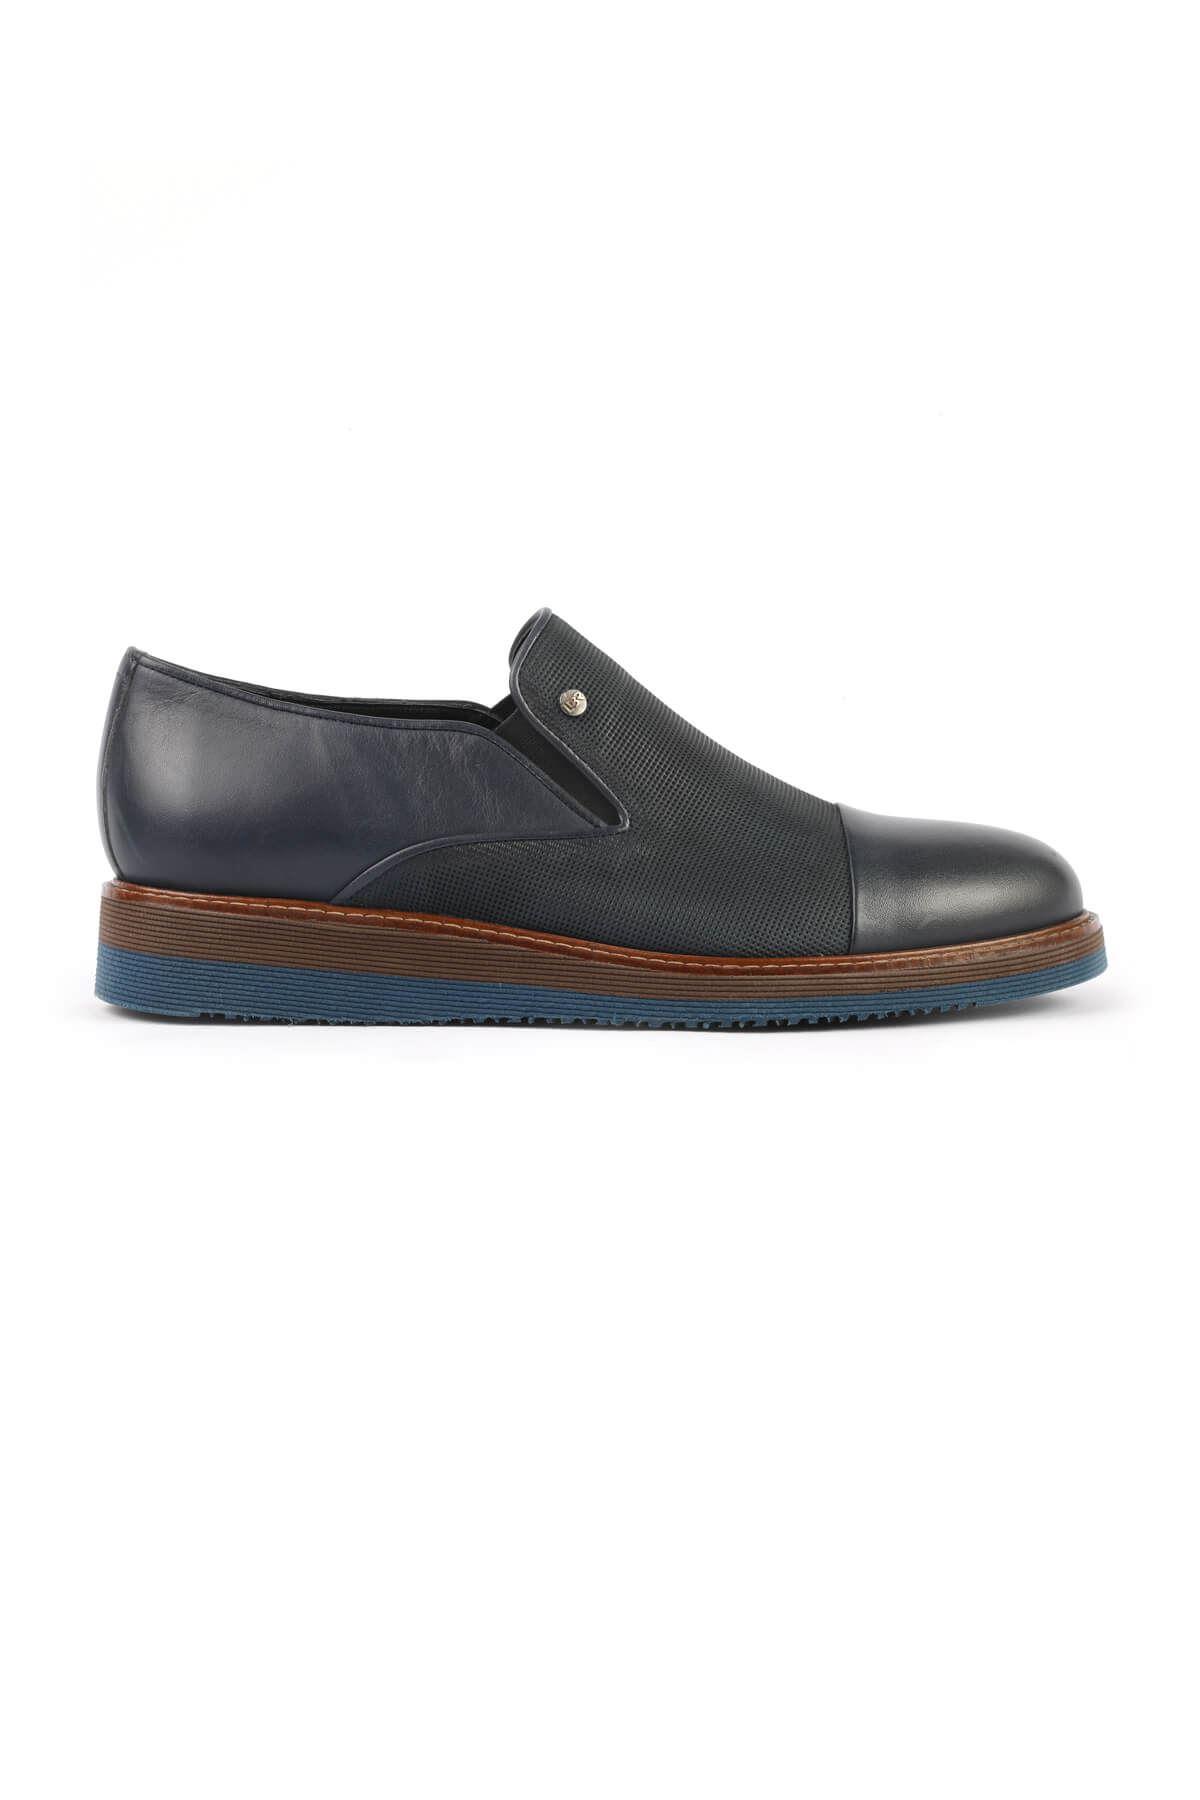 Libero 2653 Lacivert Oxford Ayakkabı